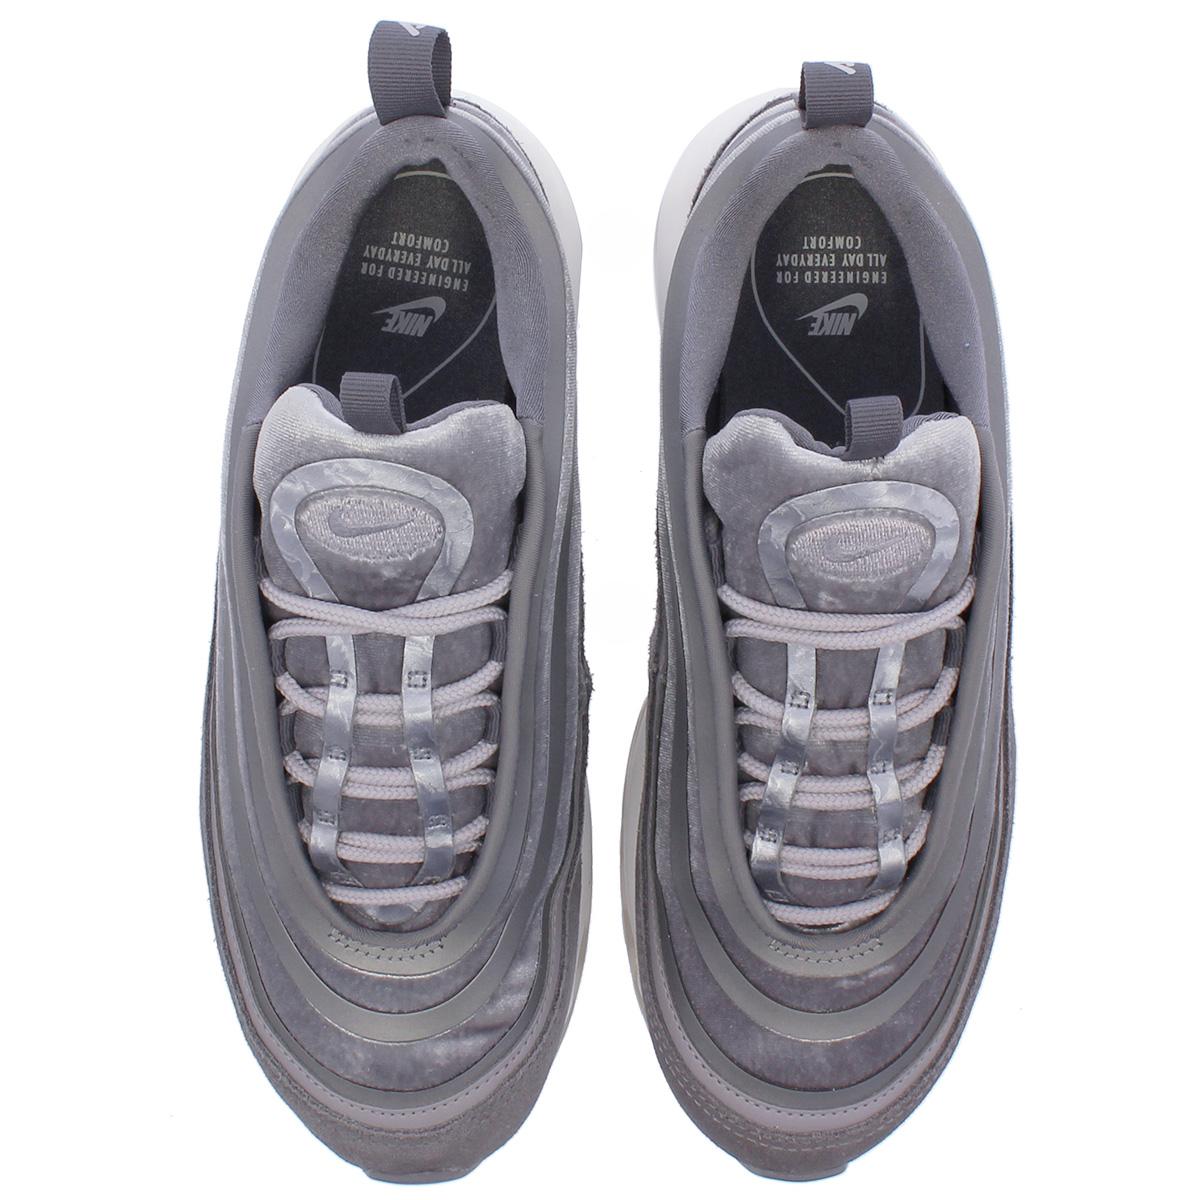 da5acfbbfda NIKE WMNS AIR MAX 97 UL  17 LX Nike women Air Max ultra  17 LX GUNSMOKE WHITE  ah6805-001